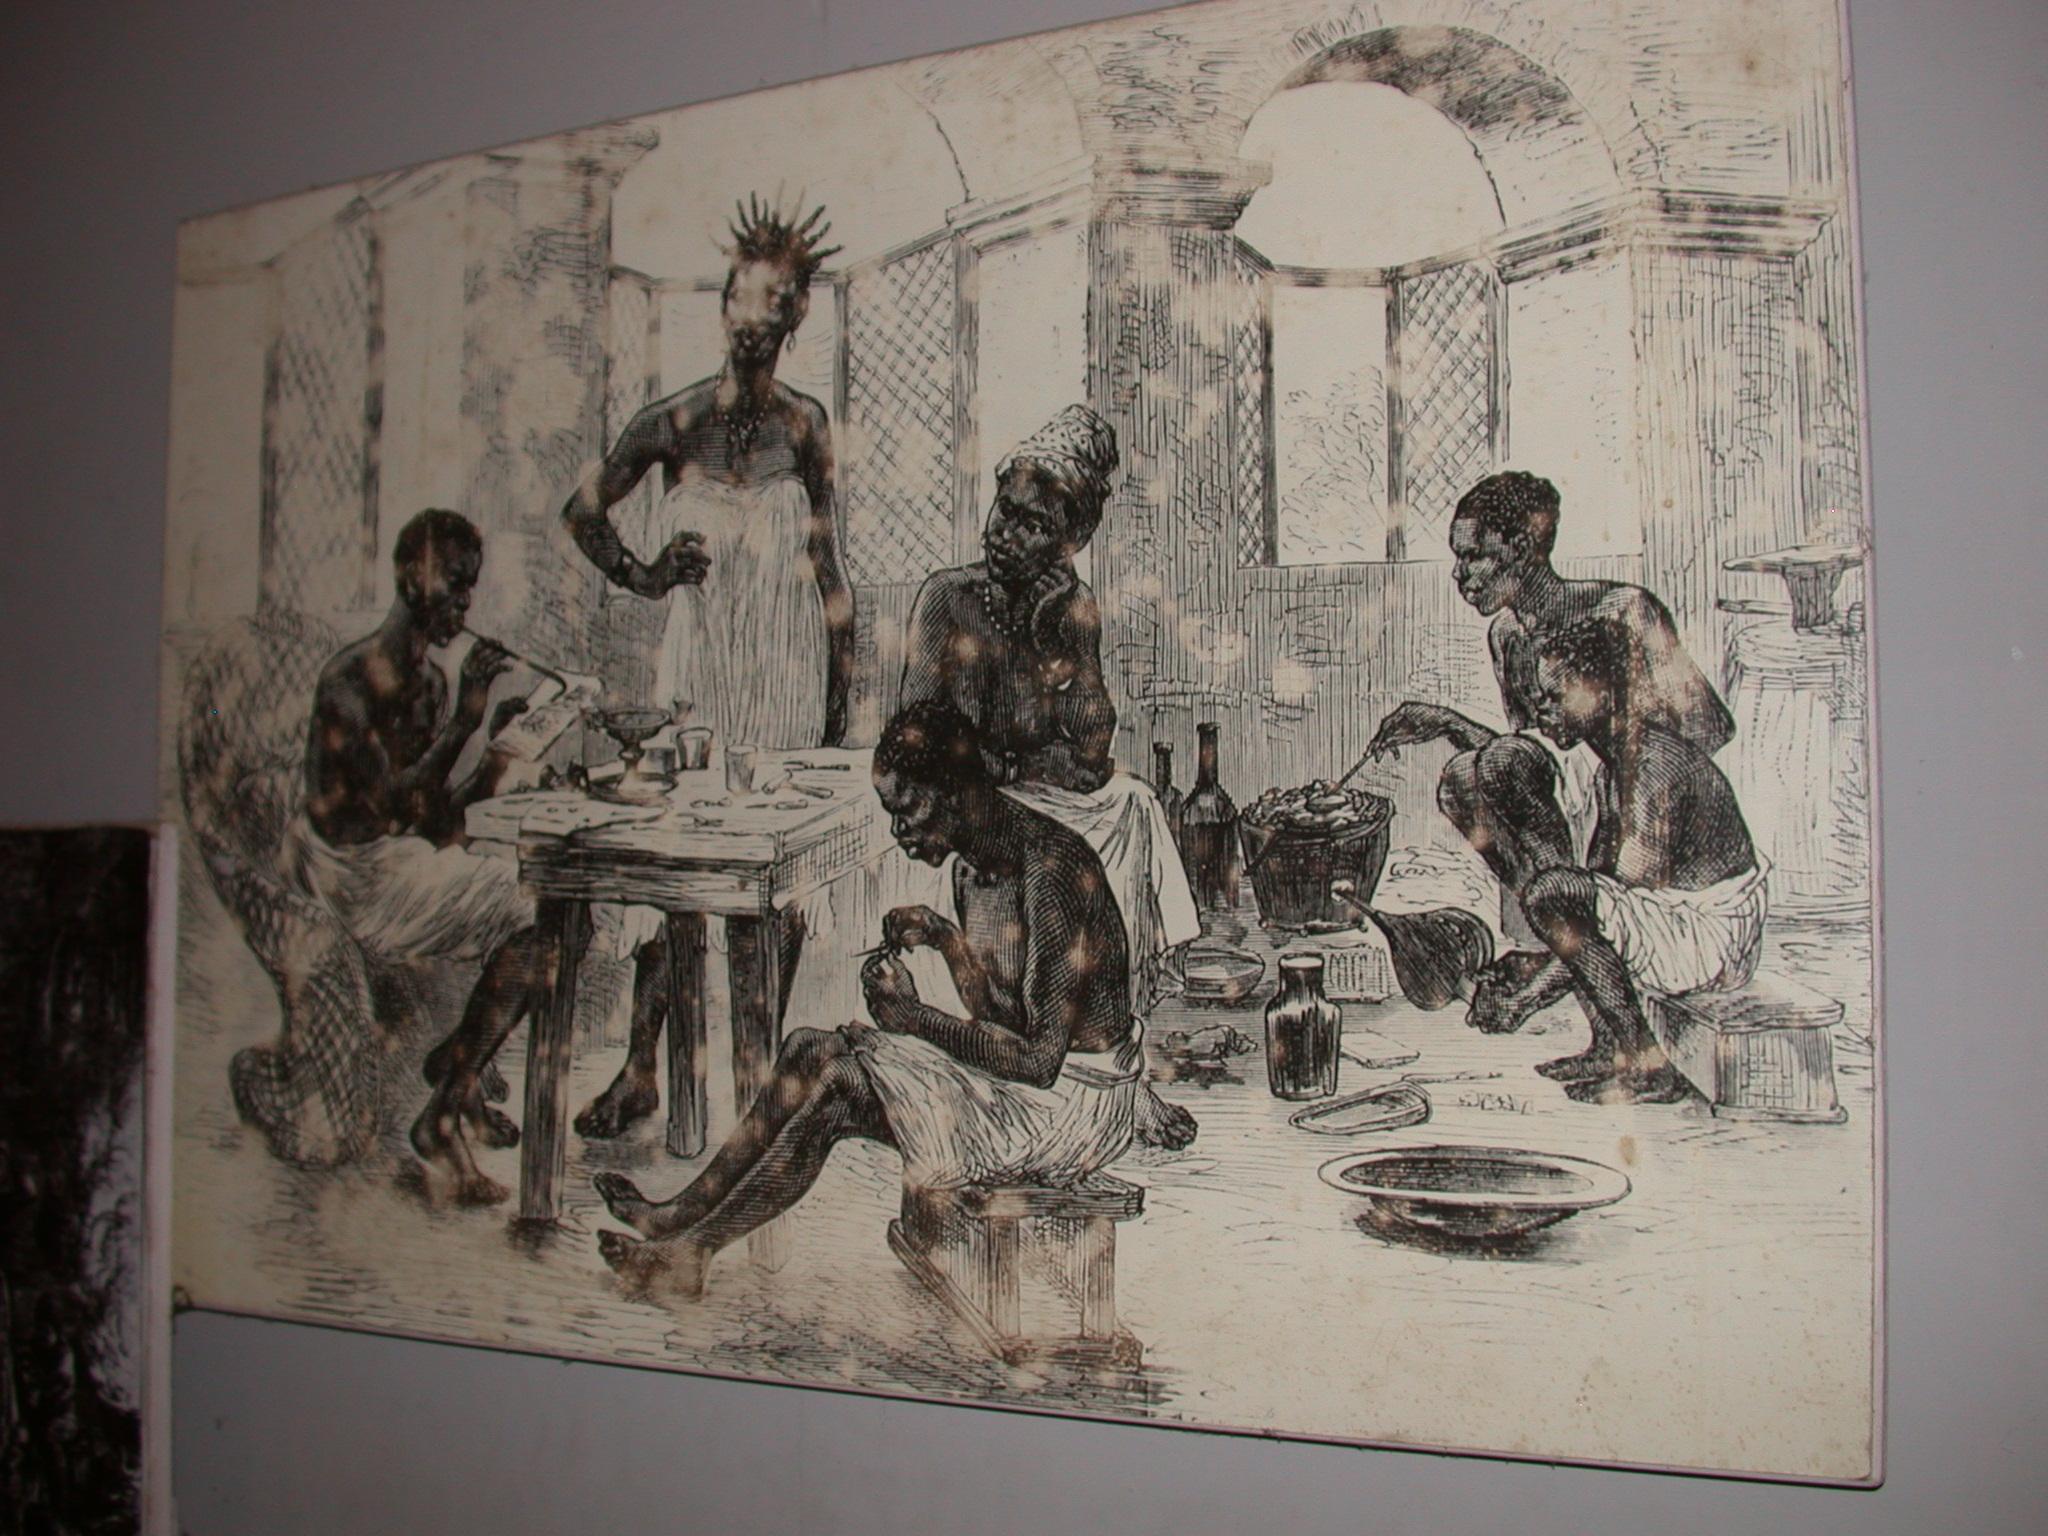 Ghana Gold Forging Drawing, Cape Coast Slave Fort Museum, Cape Coast, Ghana